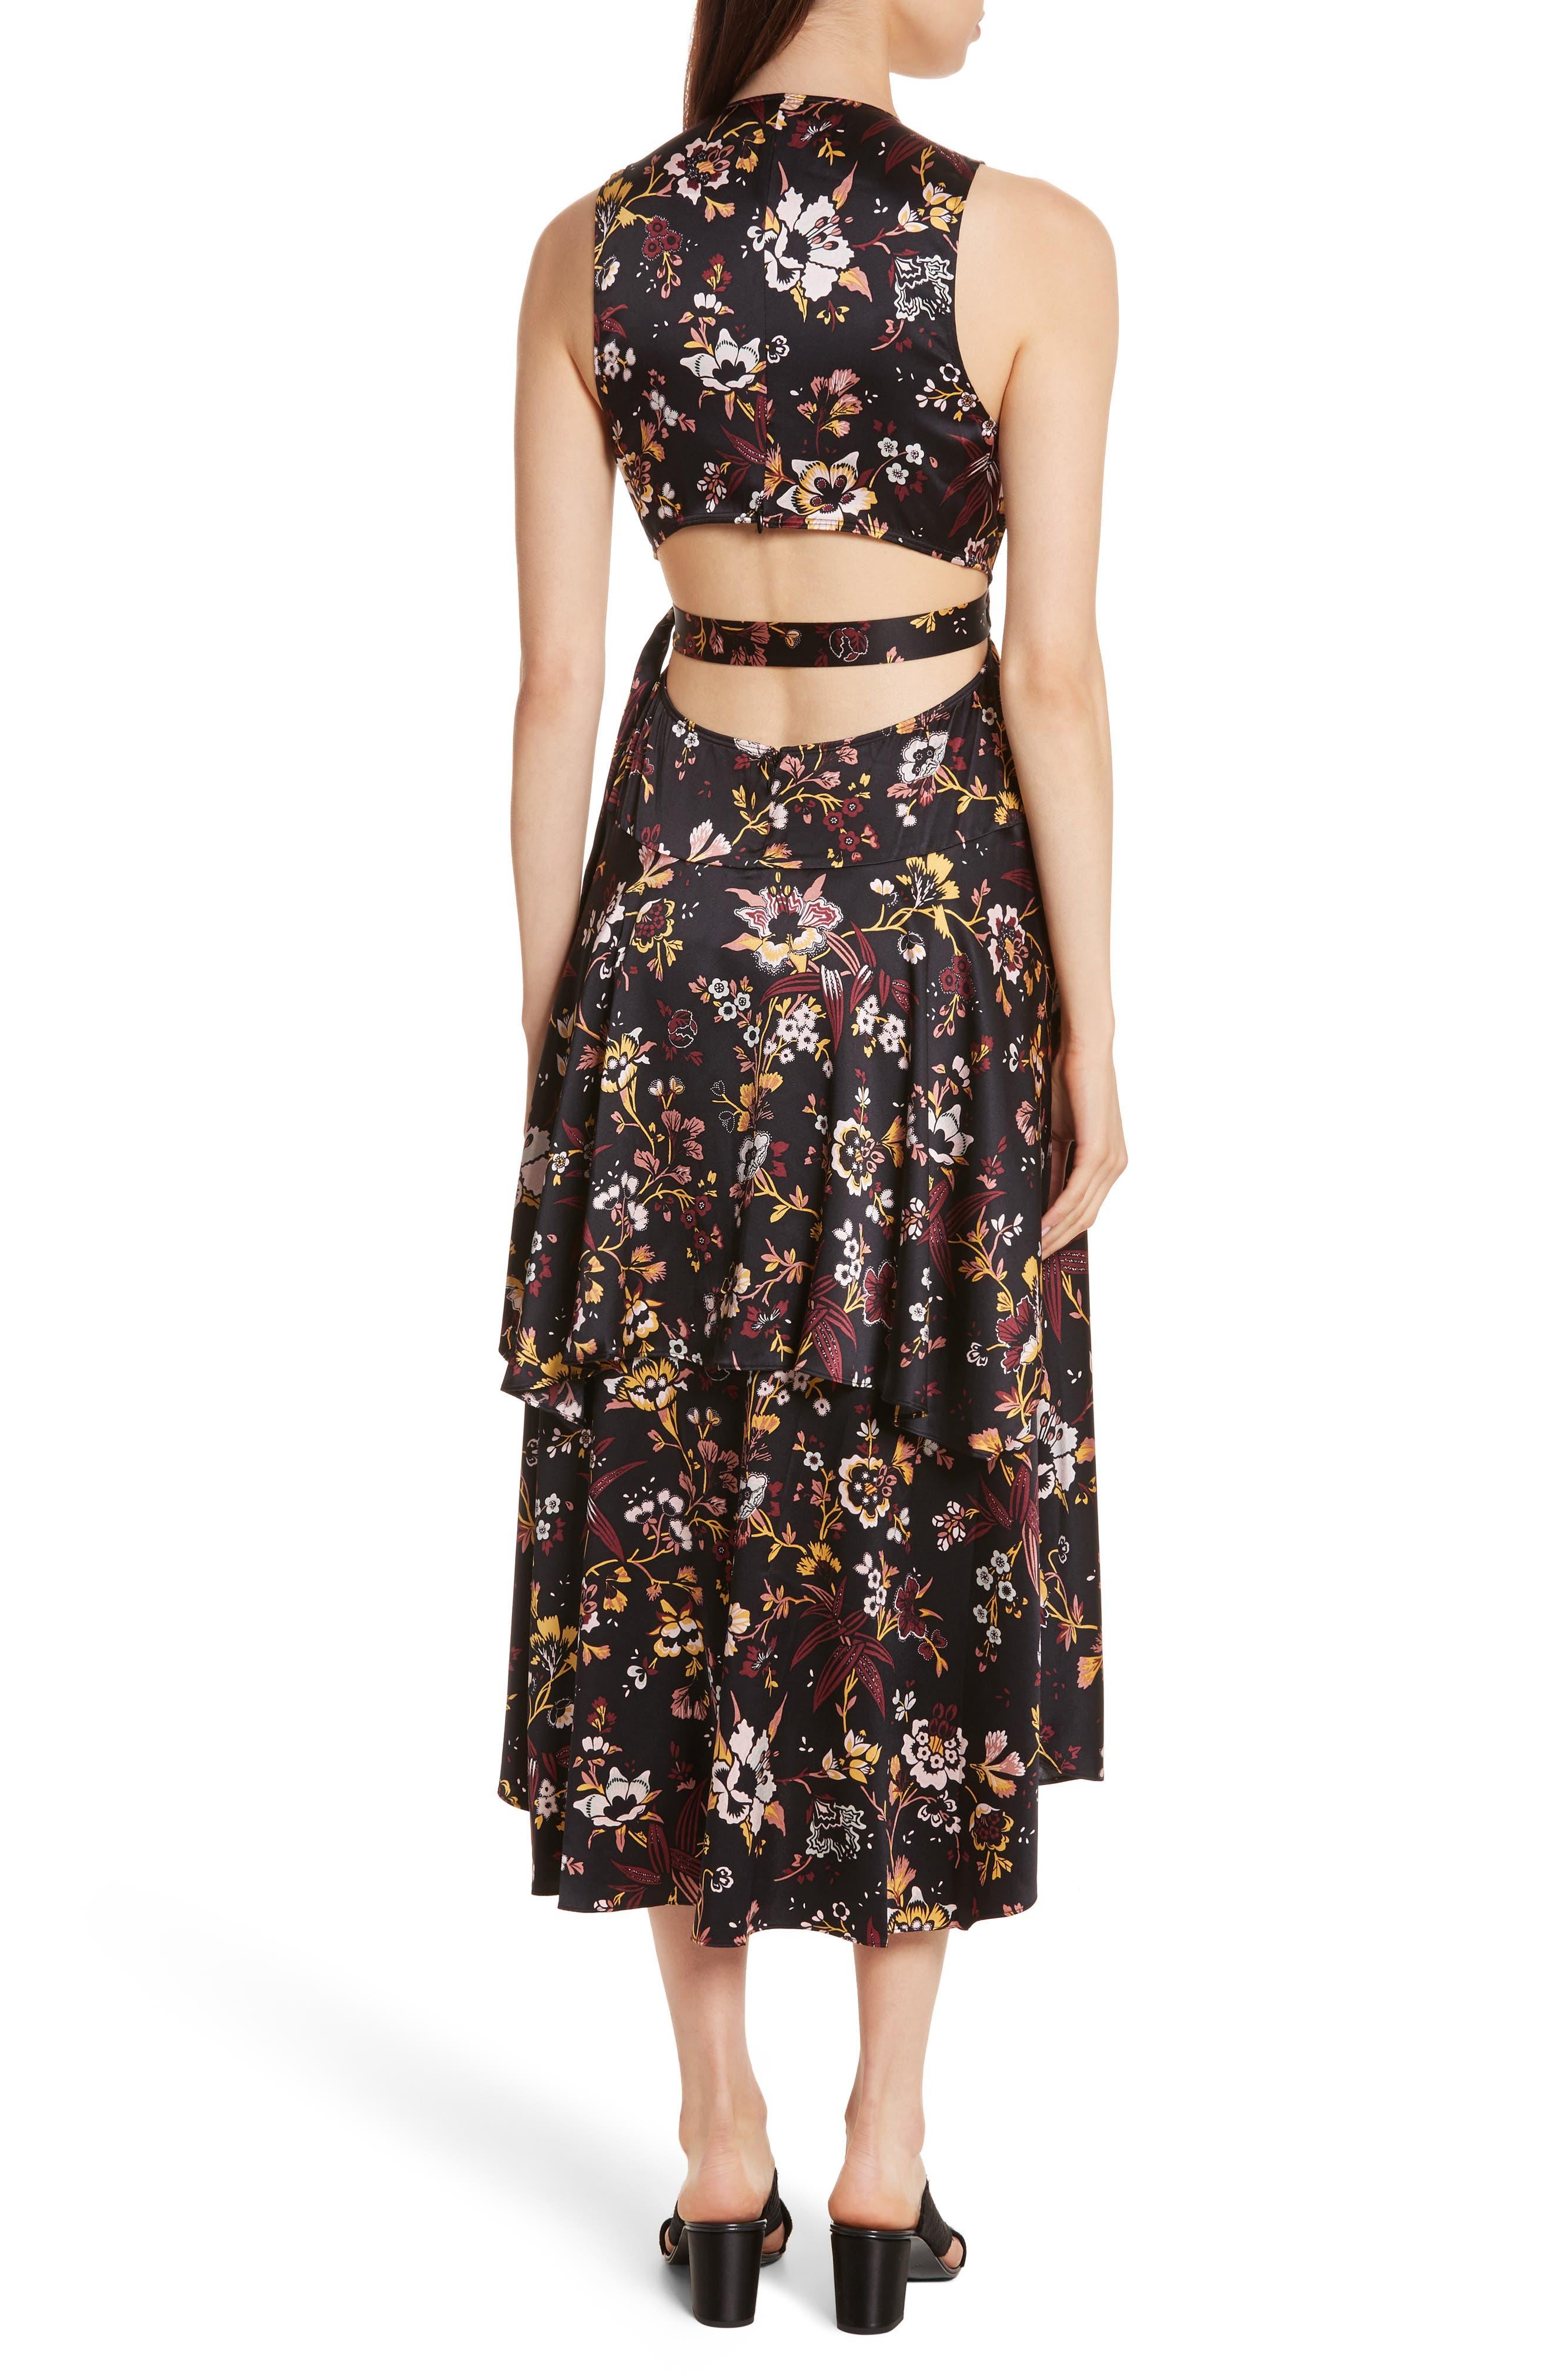 Verbena Floral Print Stretch Silk Dress,                             Alternate thumbnail 2, color,                             002